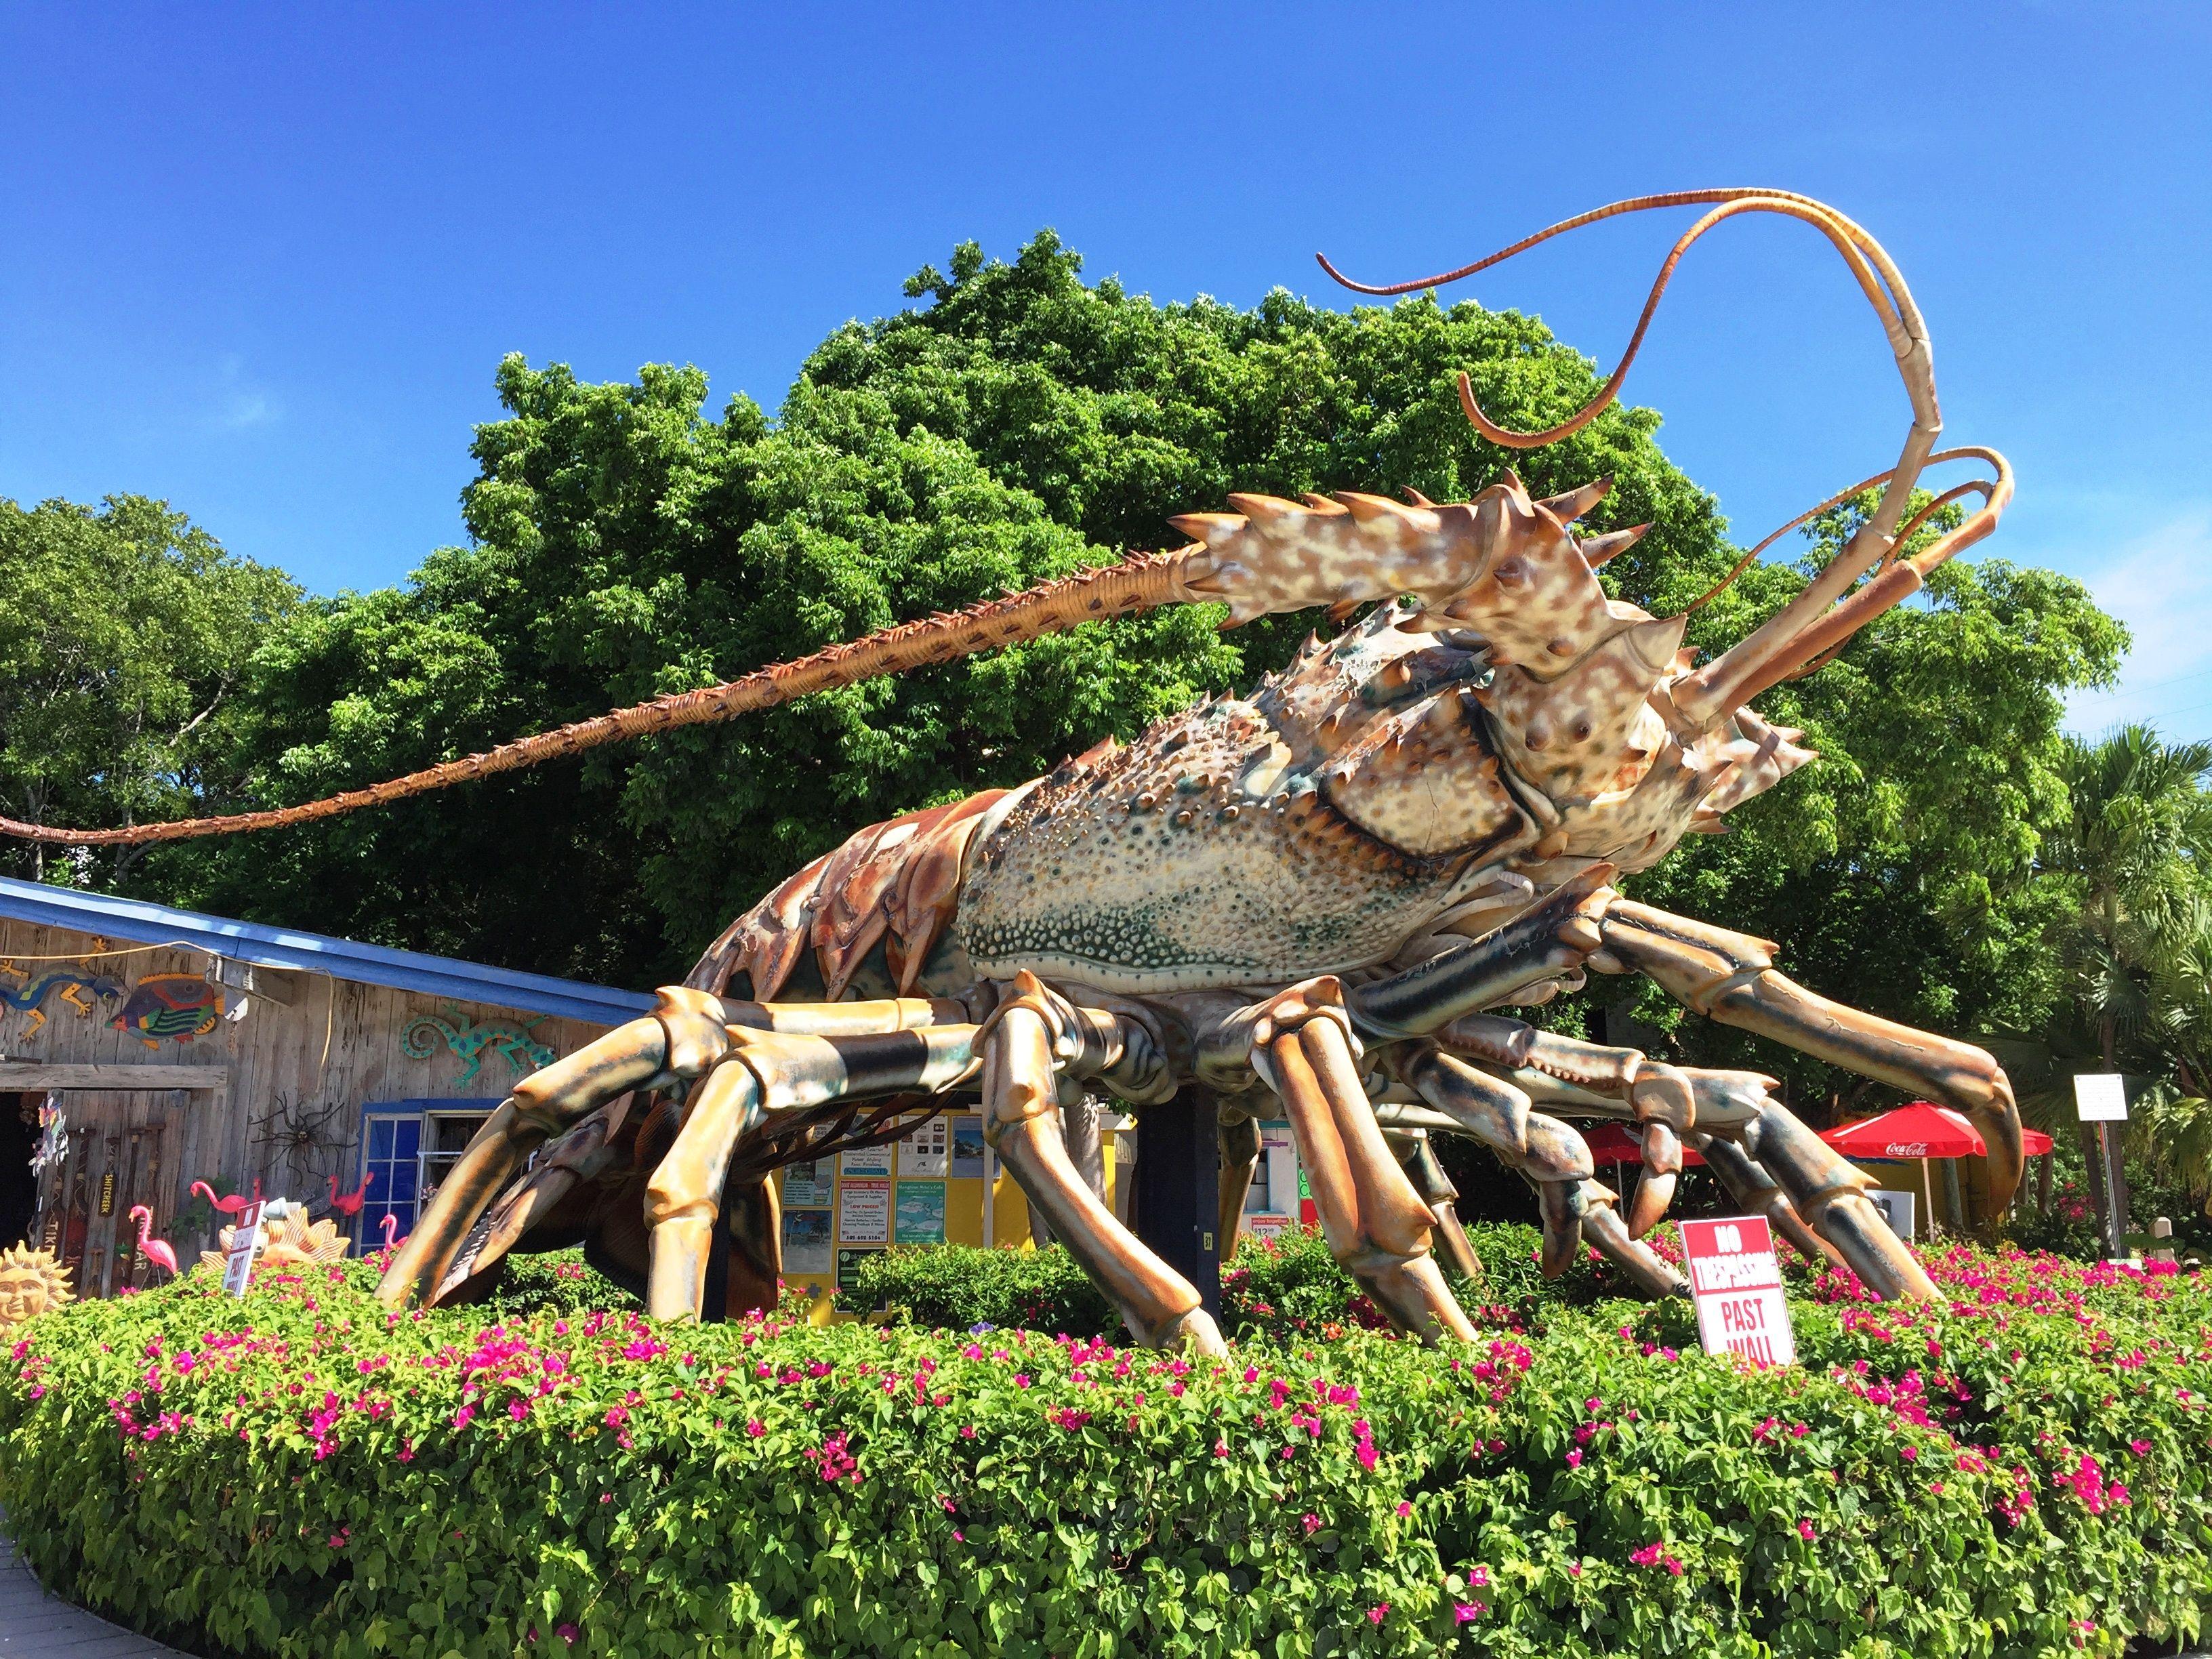 See Big Betsy, The Giant Lobster In Islamorada